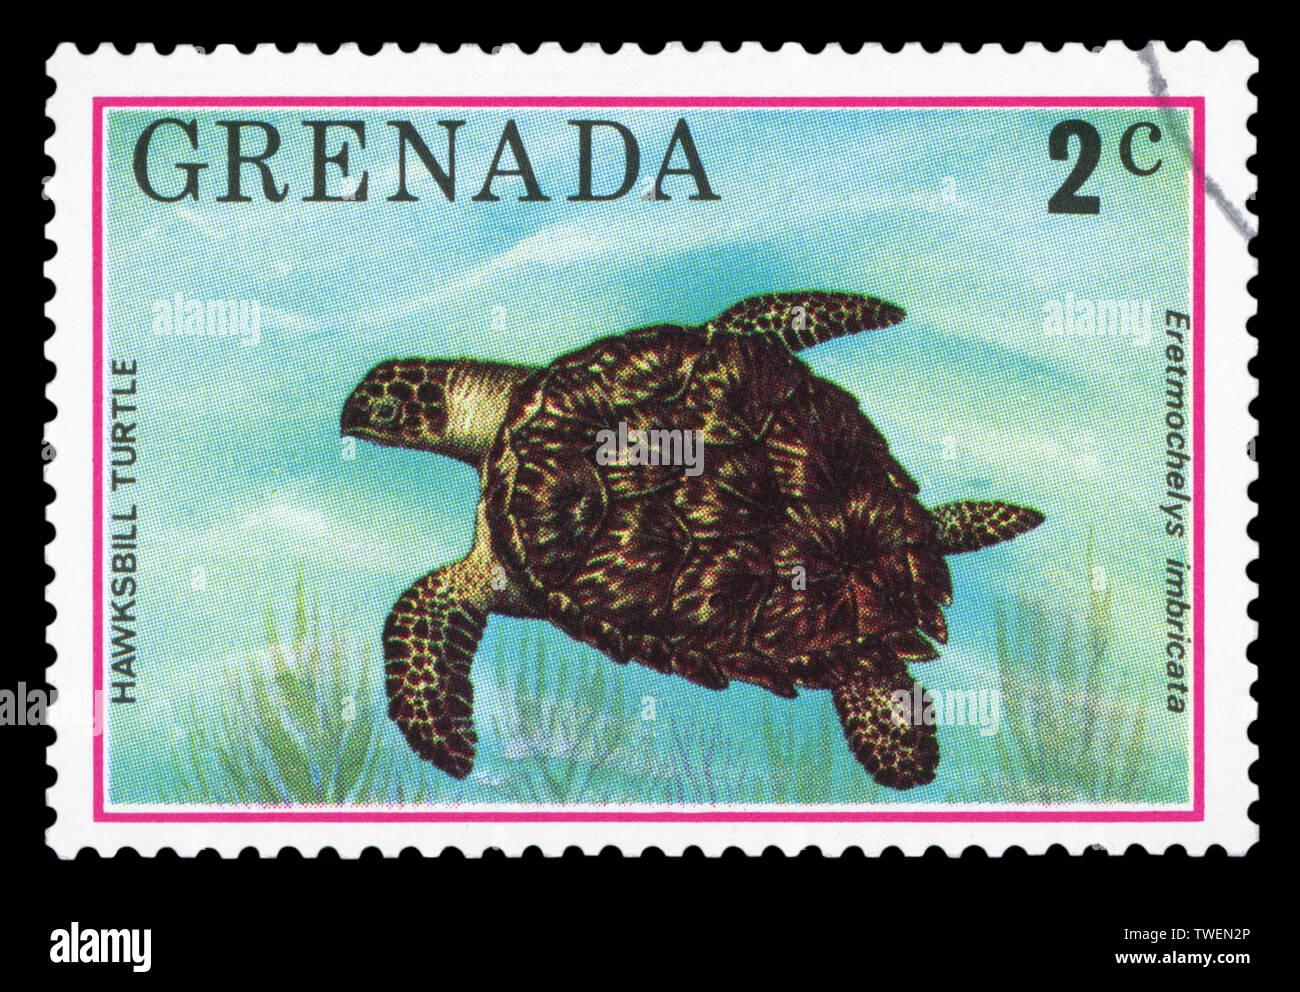 GRENADA - CIRCA 1976: A stamp printed in Grenada shows Hawksbill turtle - Eretmochelys imbricata, circa 1976. - Stock Image